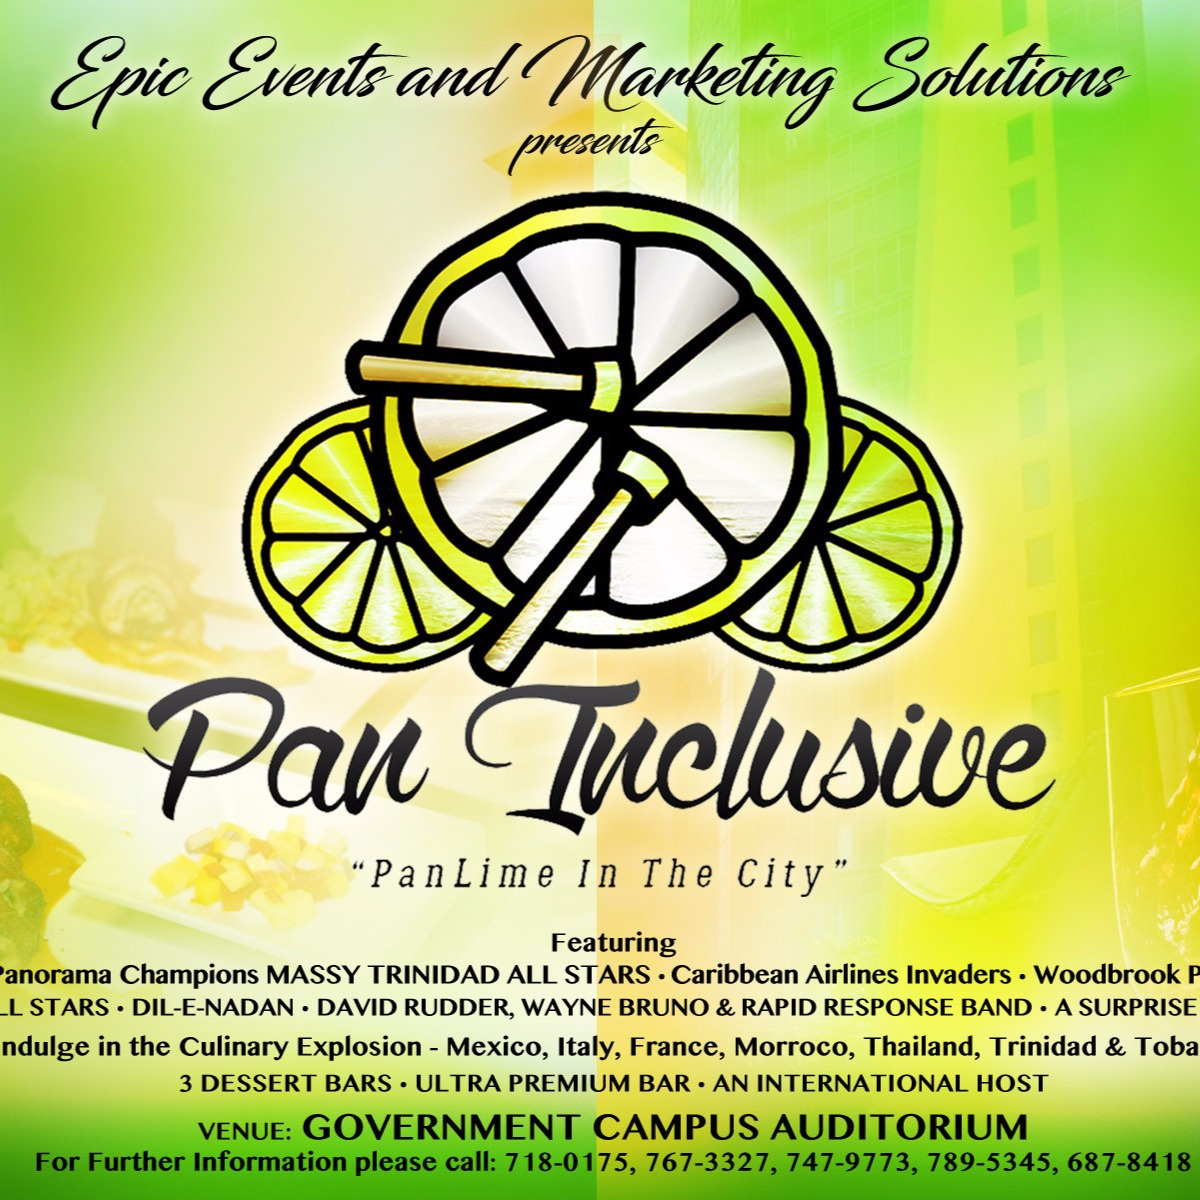 Pan Inclusive